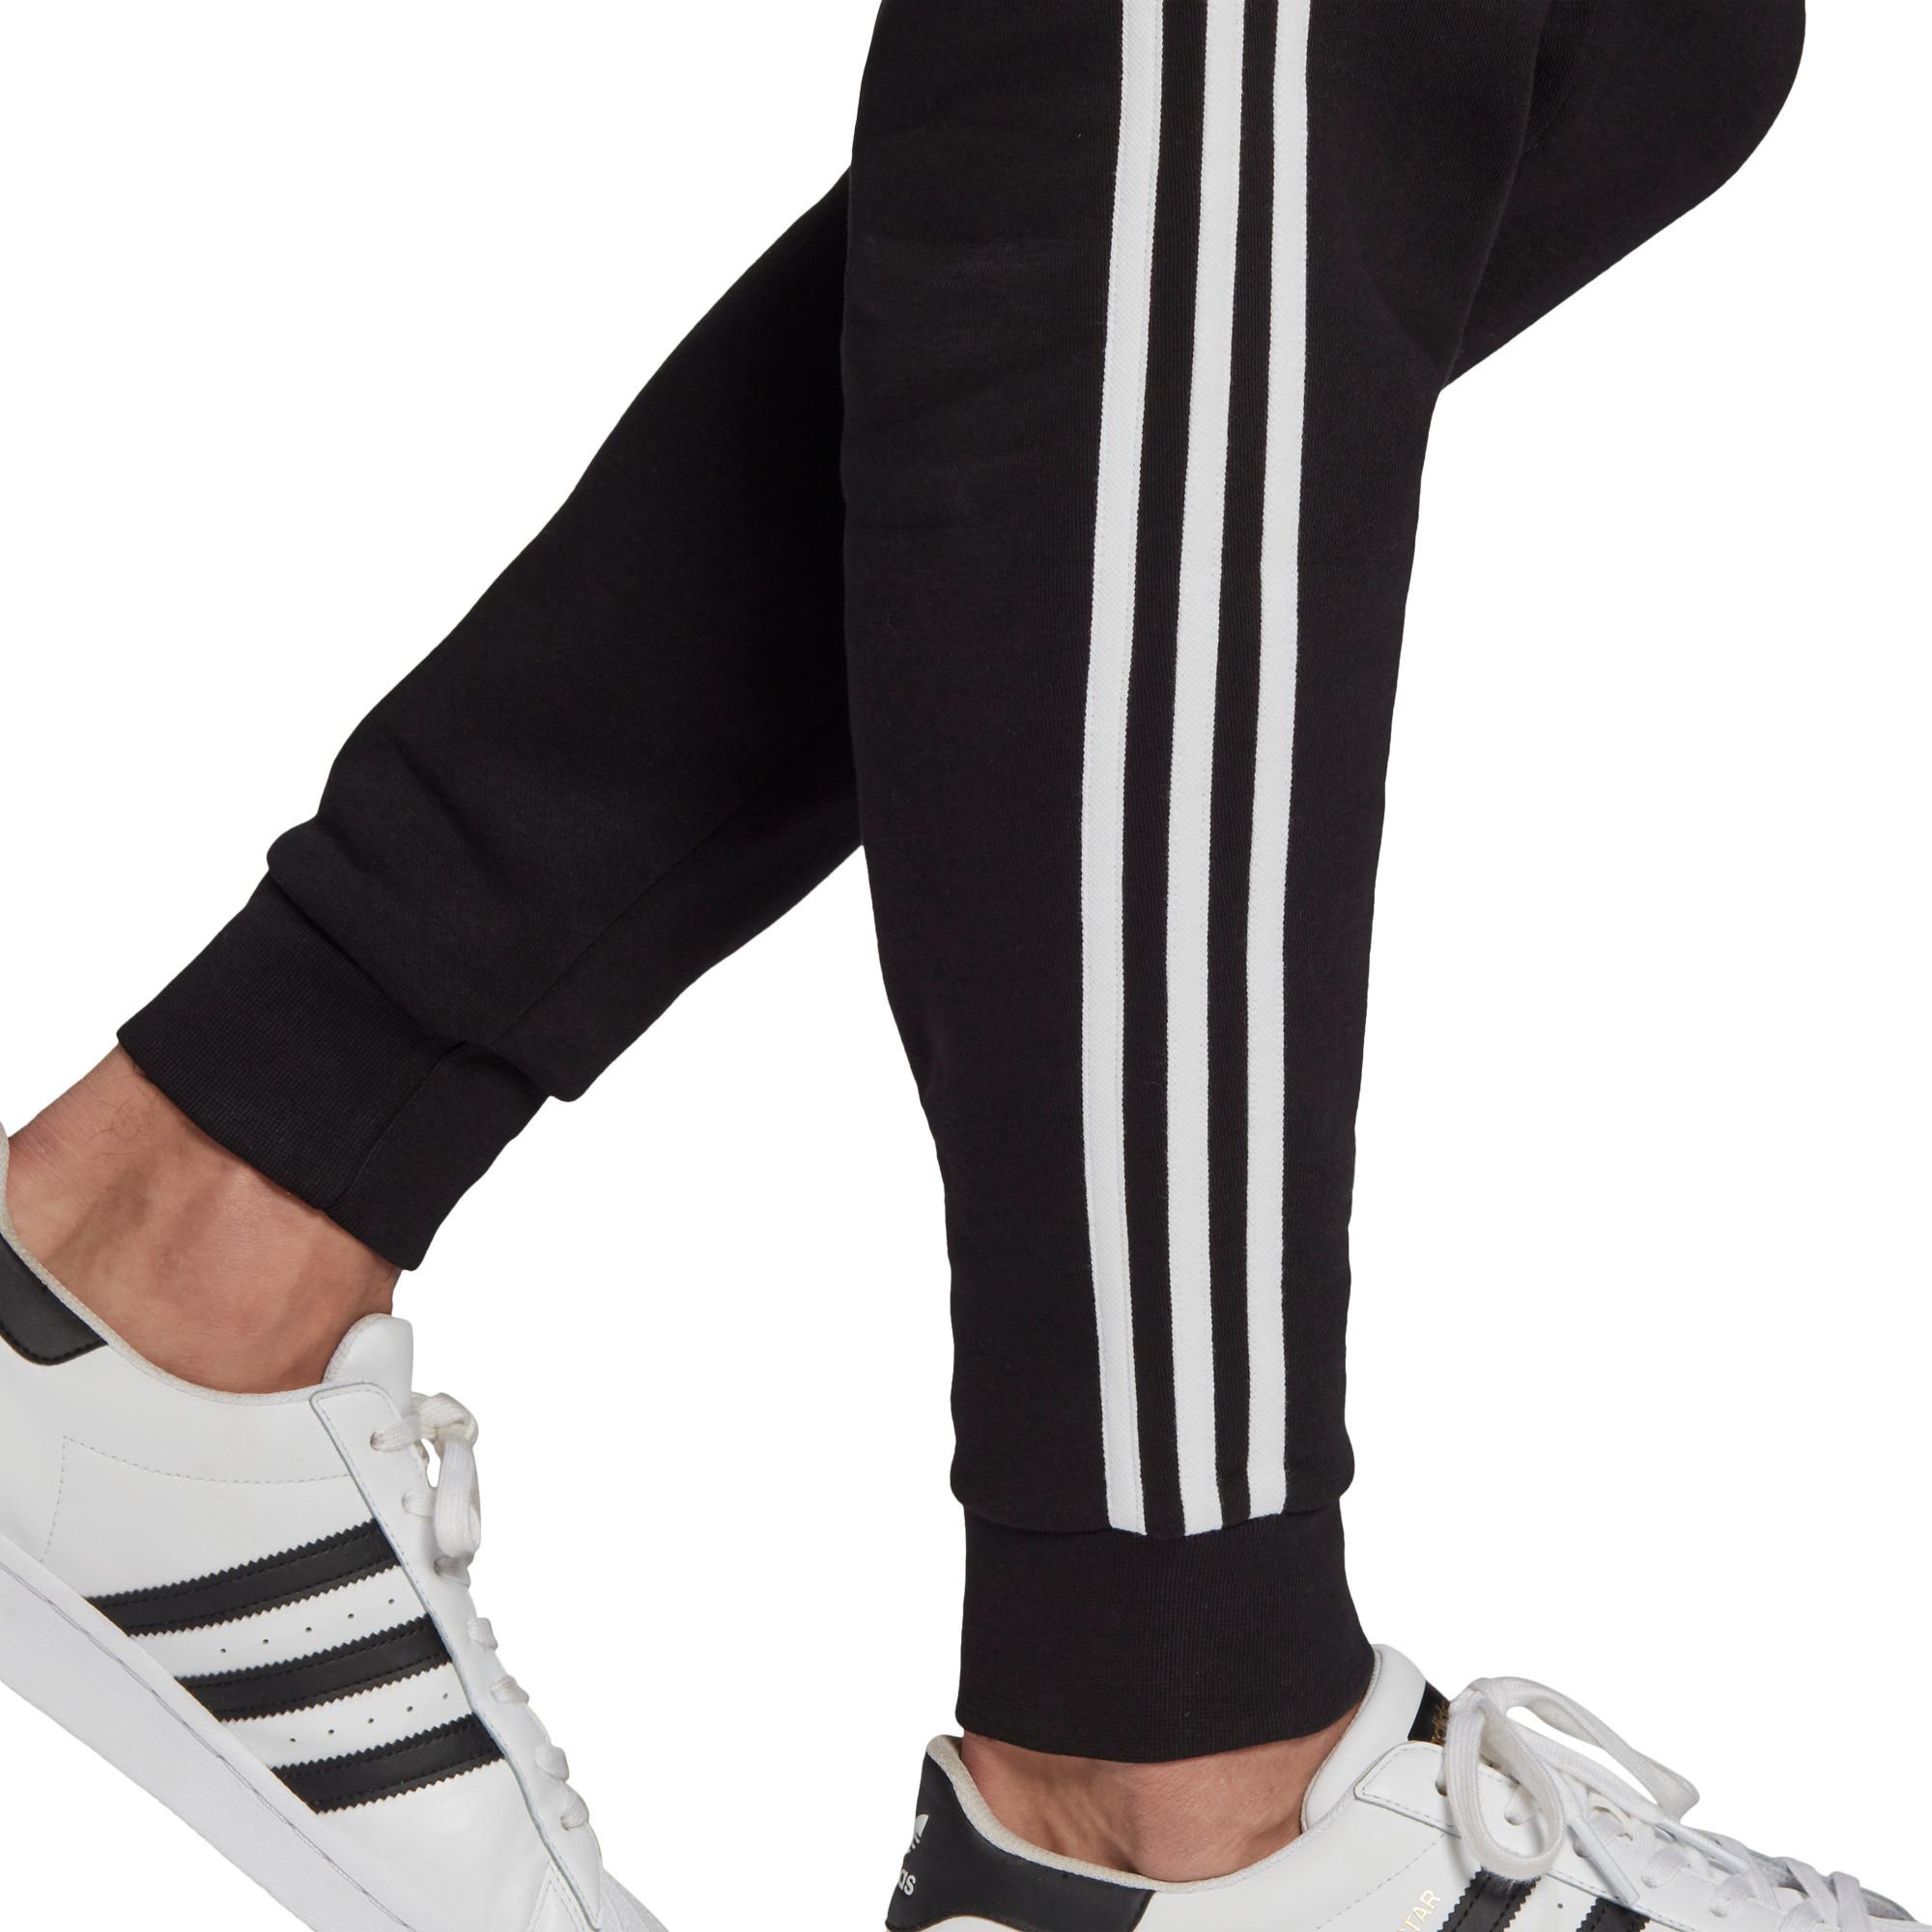 Pantaloni uomo adicolor Classics 3-Stripes, Nero, large image number 2